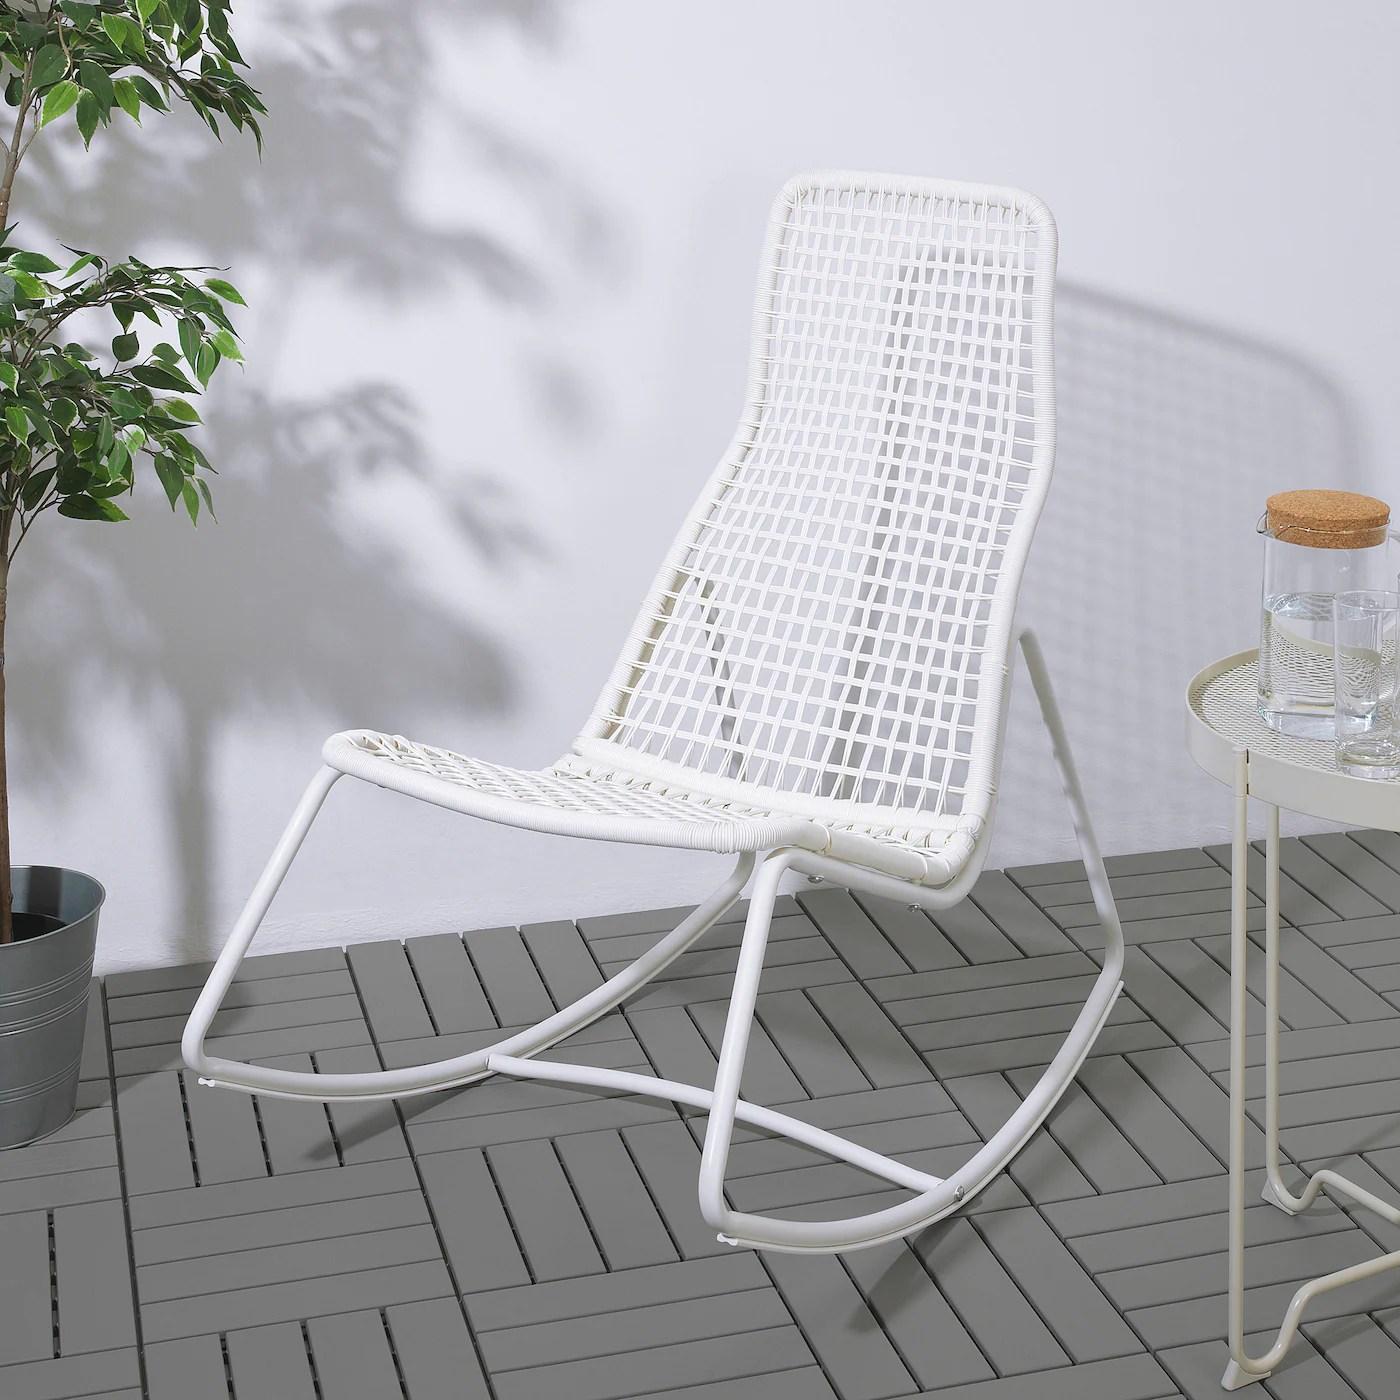 gubbon rocking chair in outdoor white